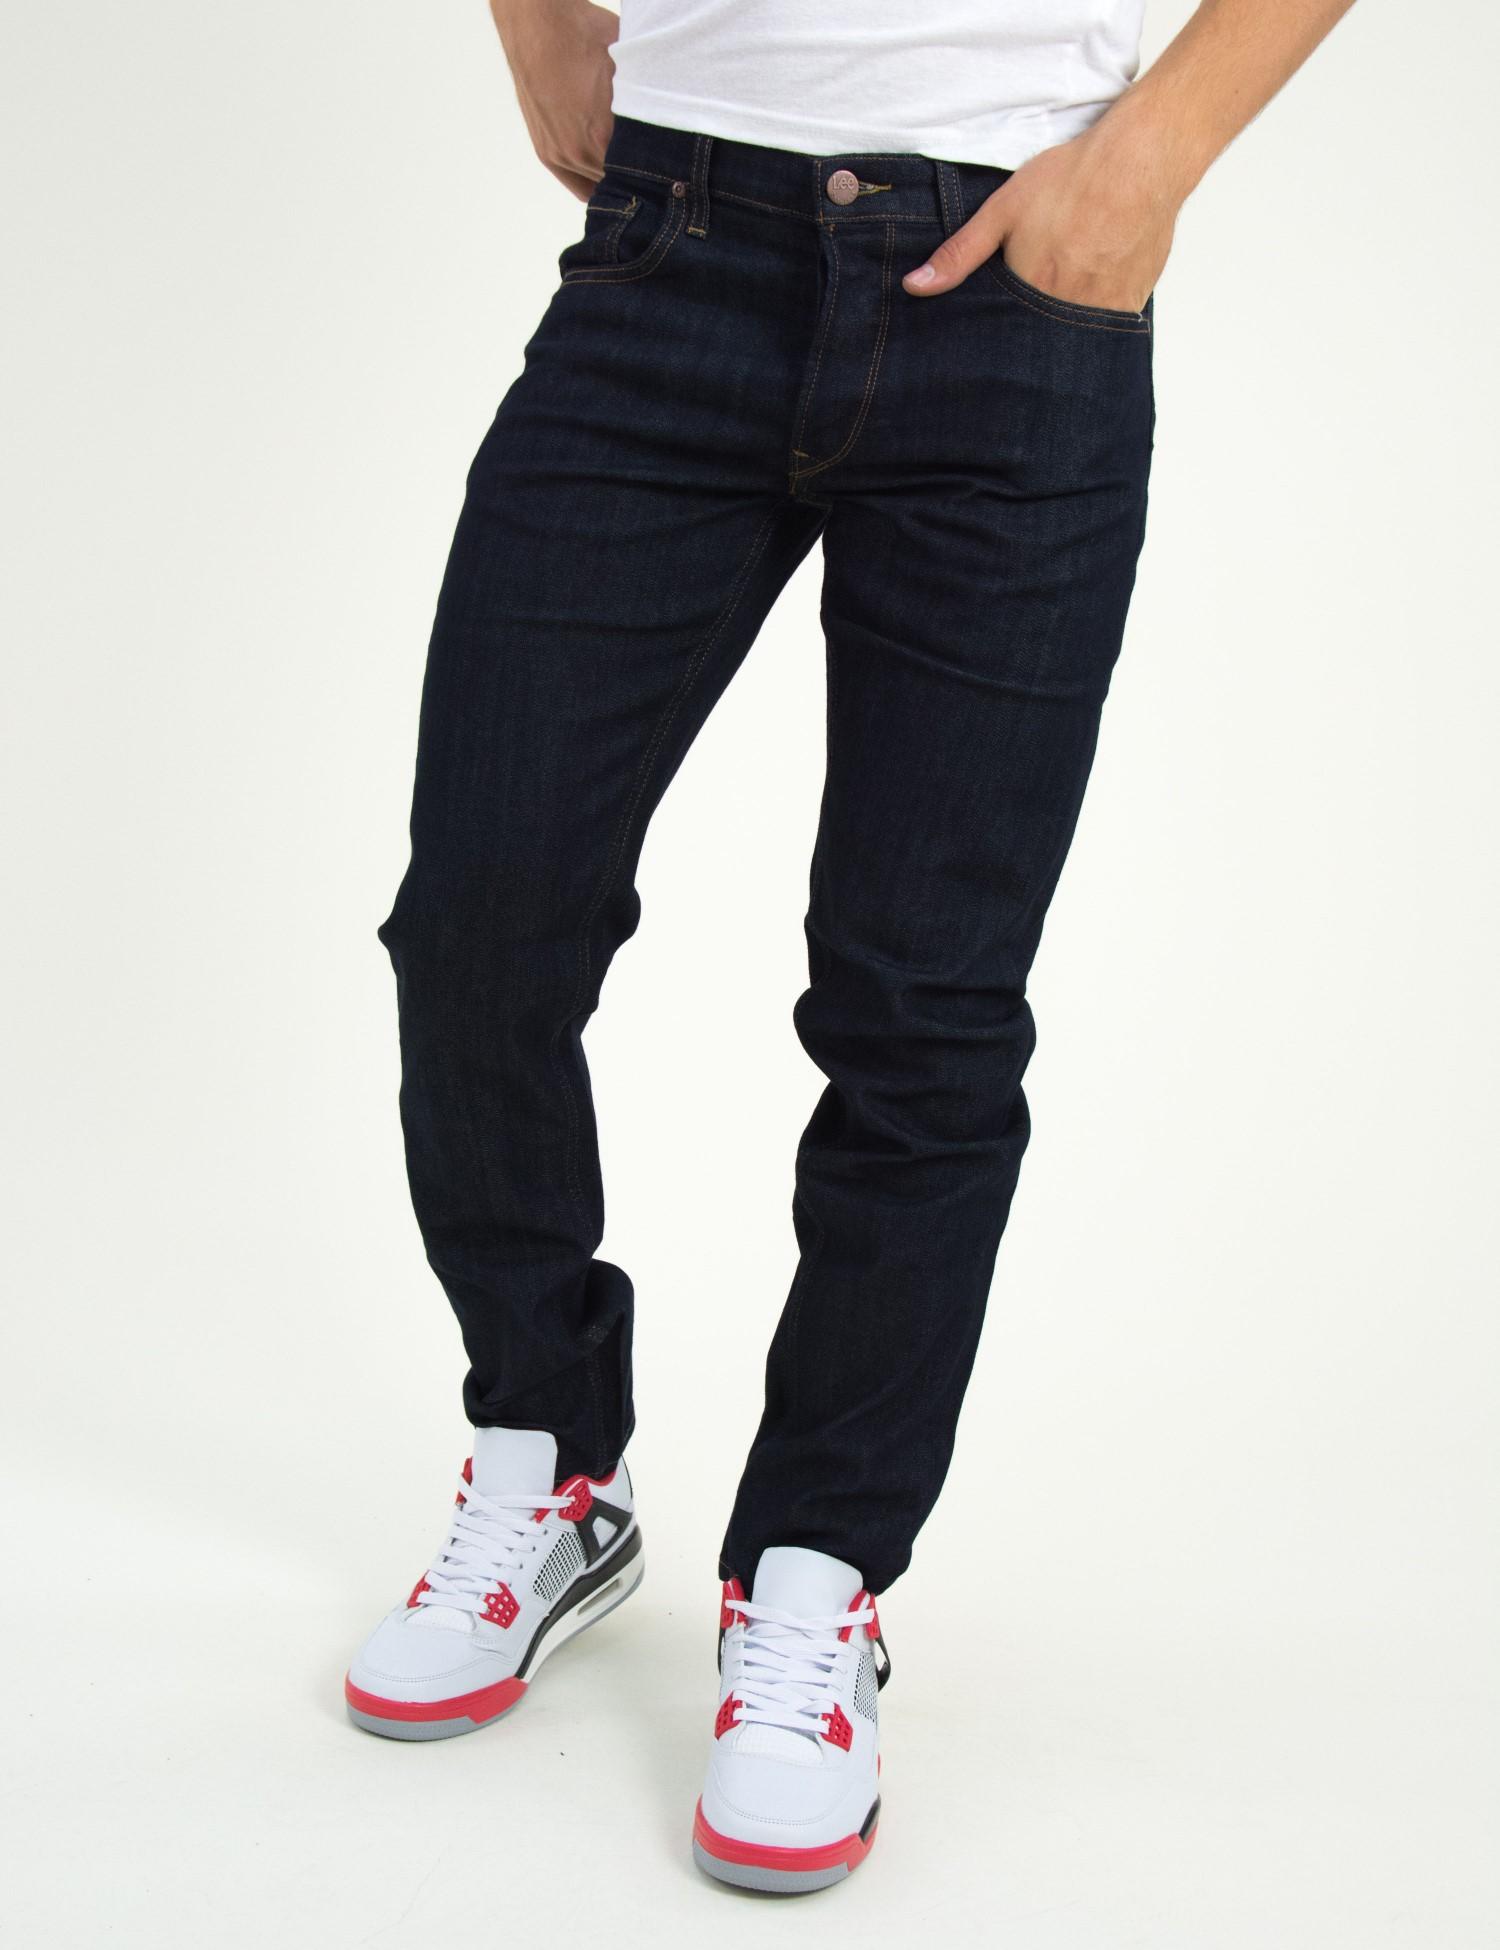 77f3c7968ae2 ΑΝΔΡΑΣ ΑΝΔΡΙΚΑ ΡΟΥΧΑ ΠΑΝΤΕΛΟΝΙΑ Τζήν Jeans